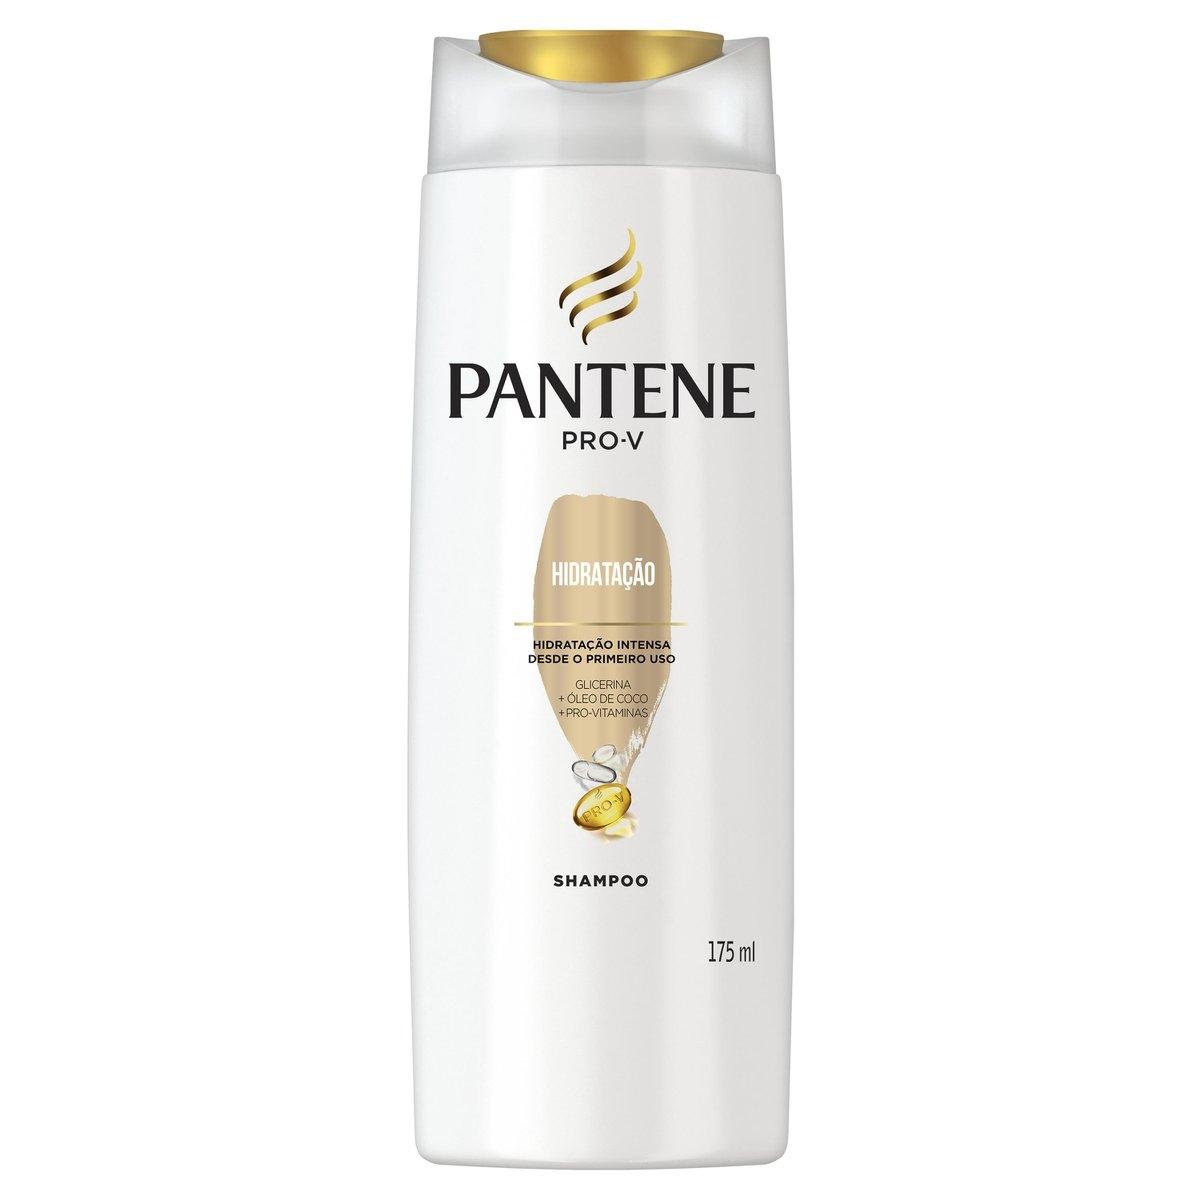 Shampoo Pantene Hidratação 175ml 175ml